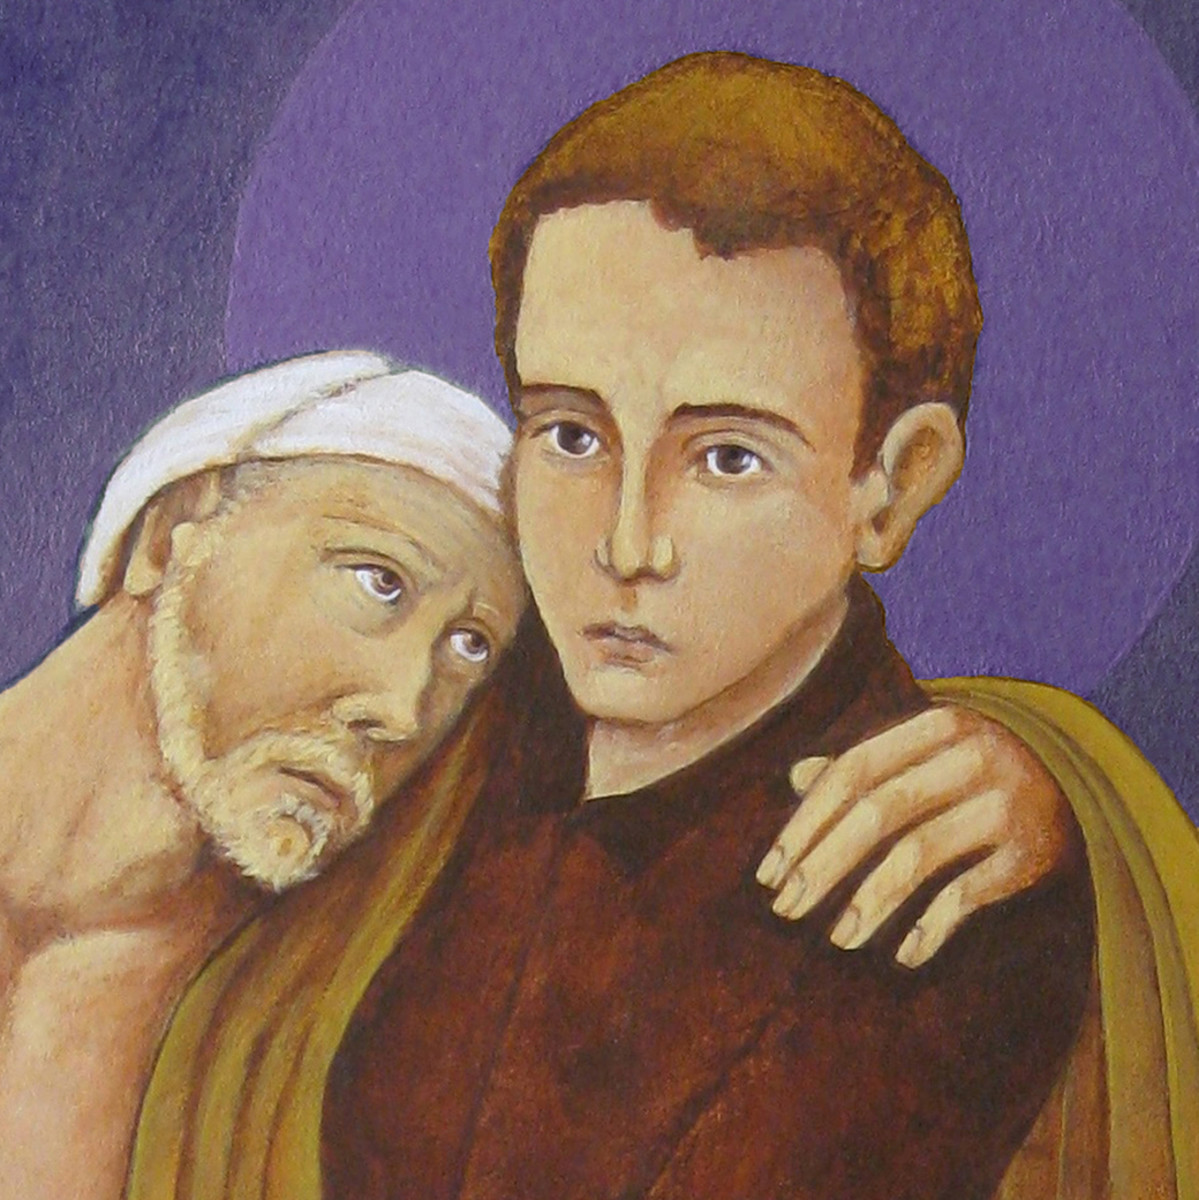 The Real Saint Aloysius Gonzaga Owlcation